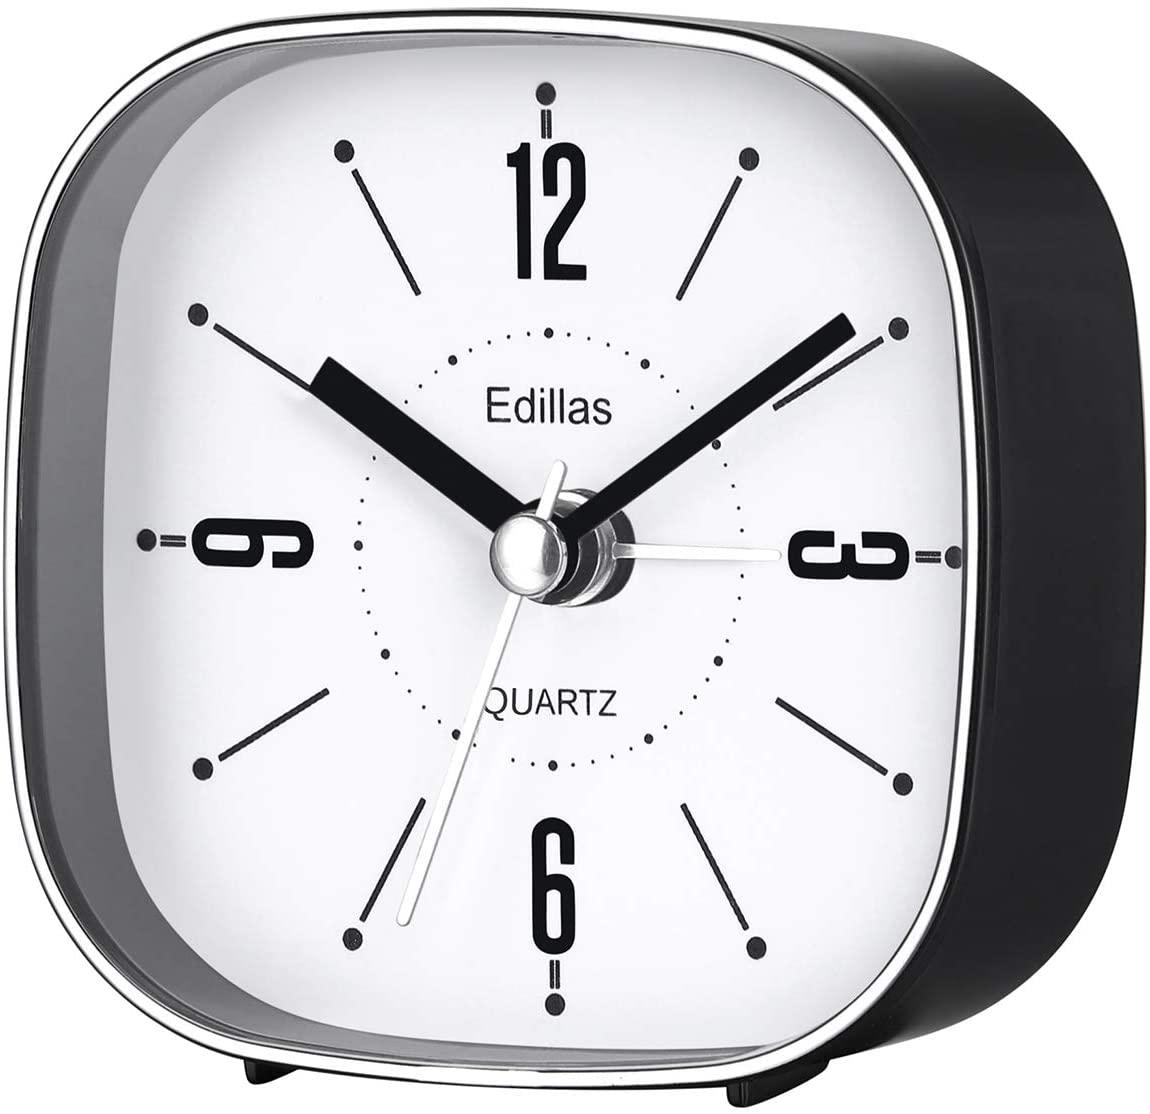 Edillas Small Analog Alarm Clocks,3 Inch Simple Stylish Portable Travel Alarm Clock Silent Battery Operated Non Ticking Alarm Clock for Table Desk Bedrooms (Black)